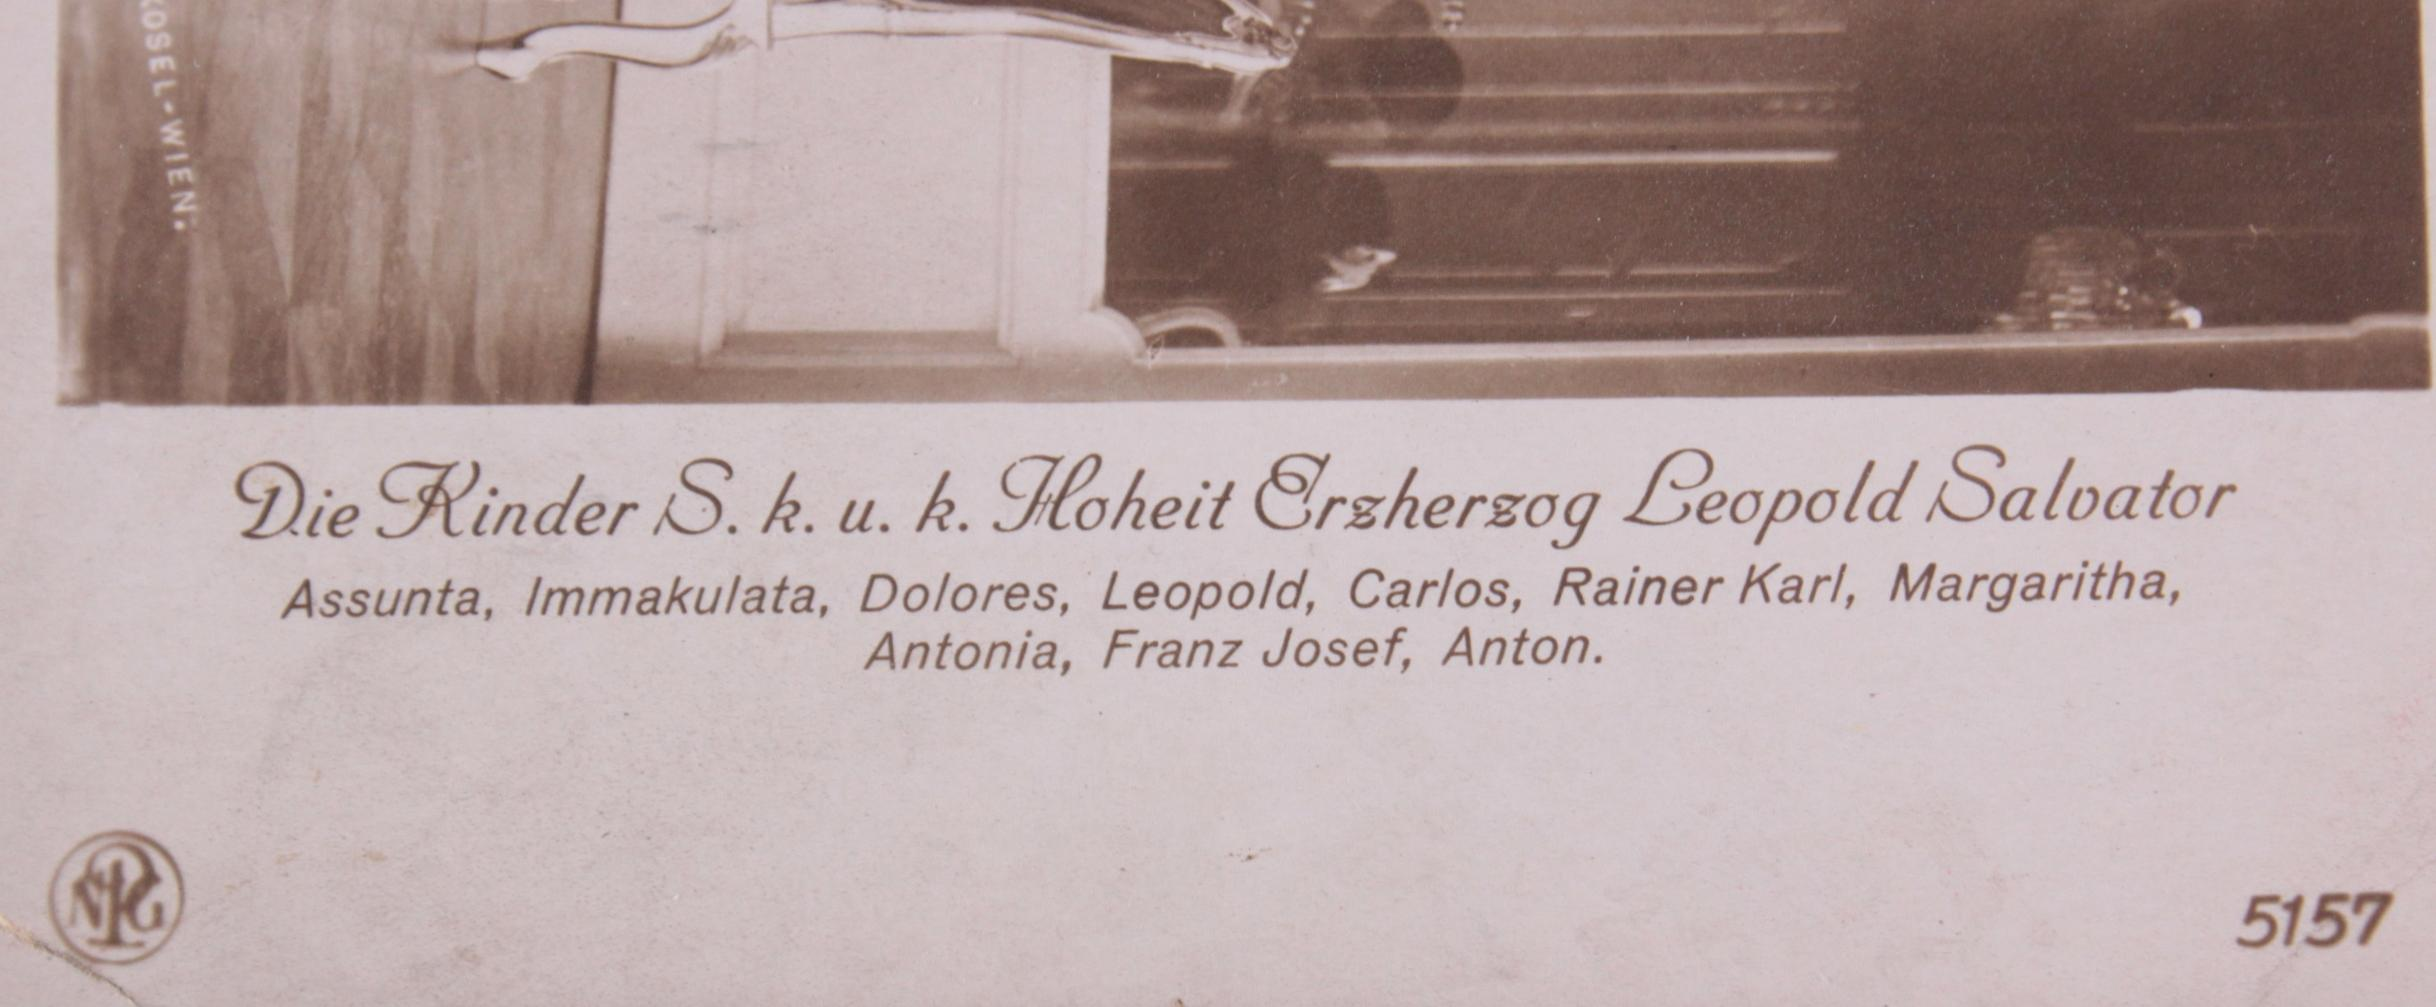 Postkarte mit Autograph Erzherzogin Blanca de Borbòn (1868-1949)-3